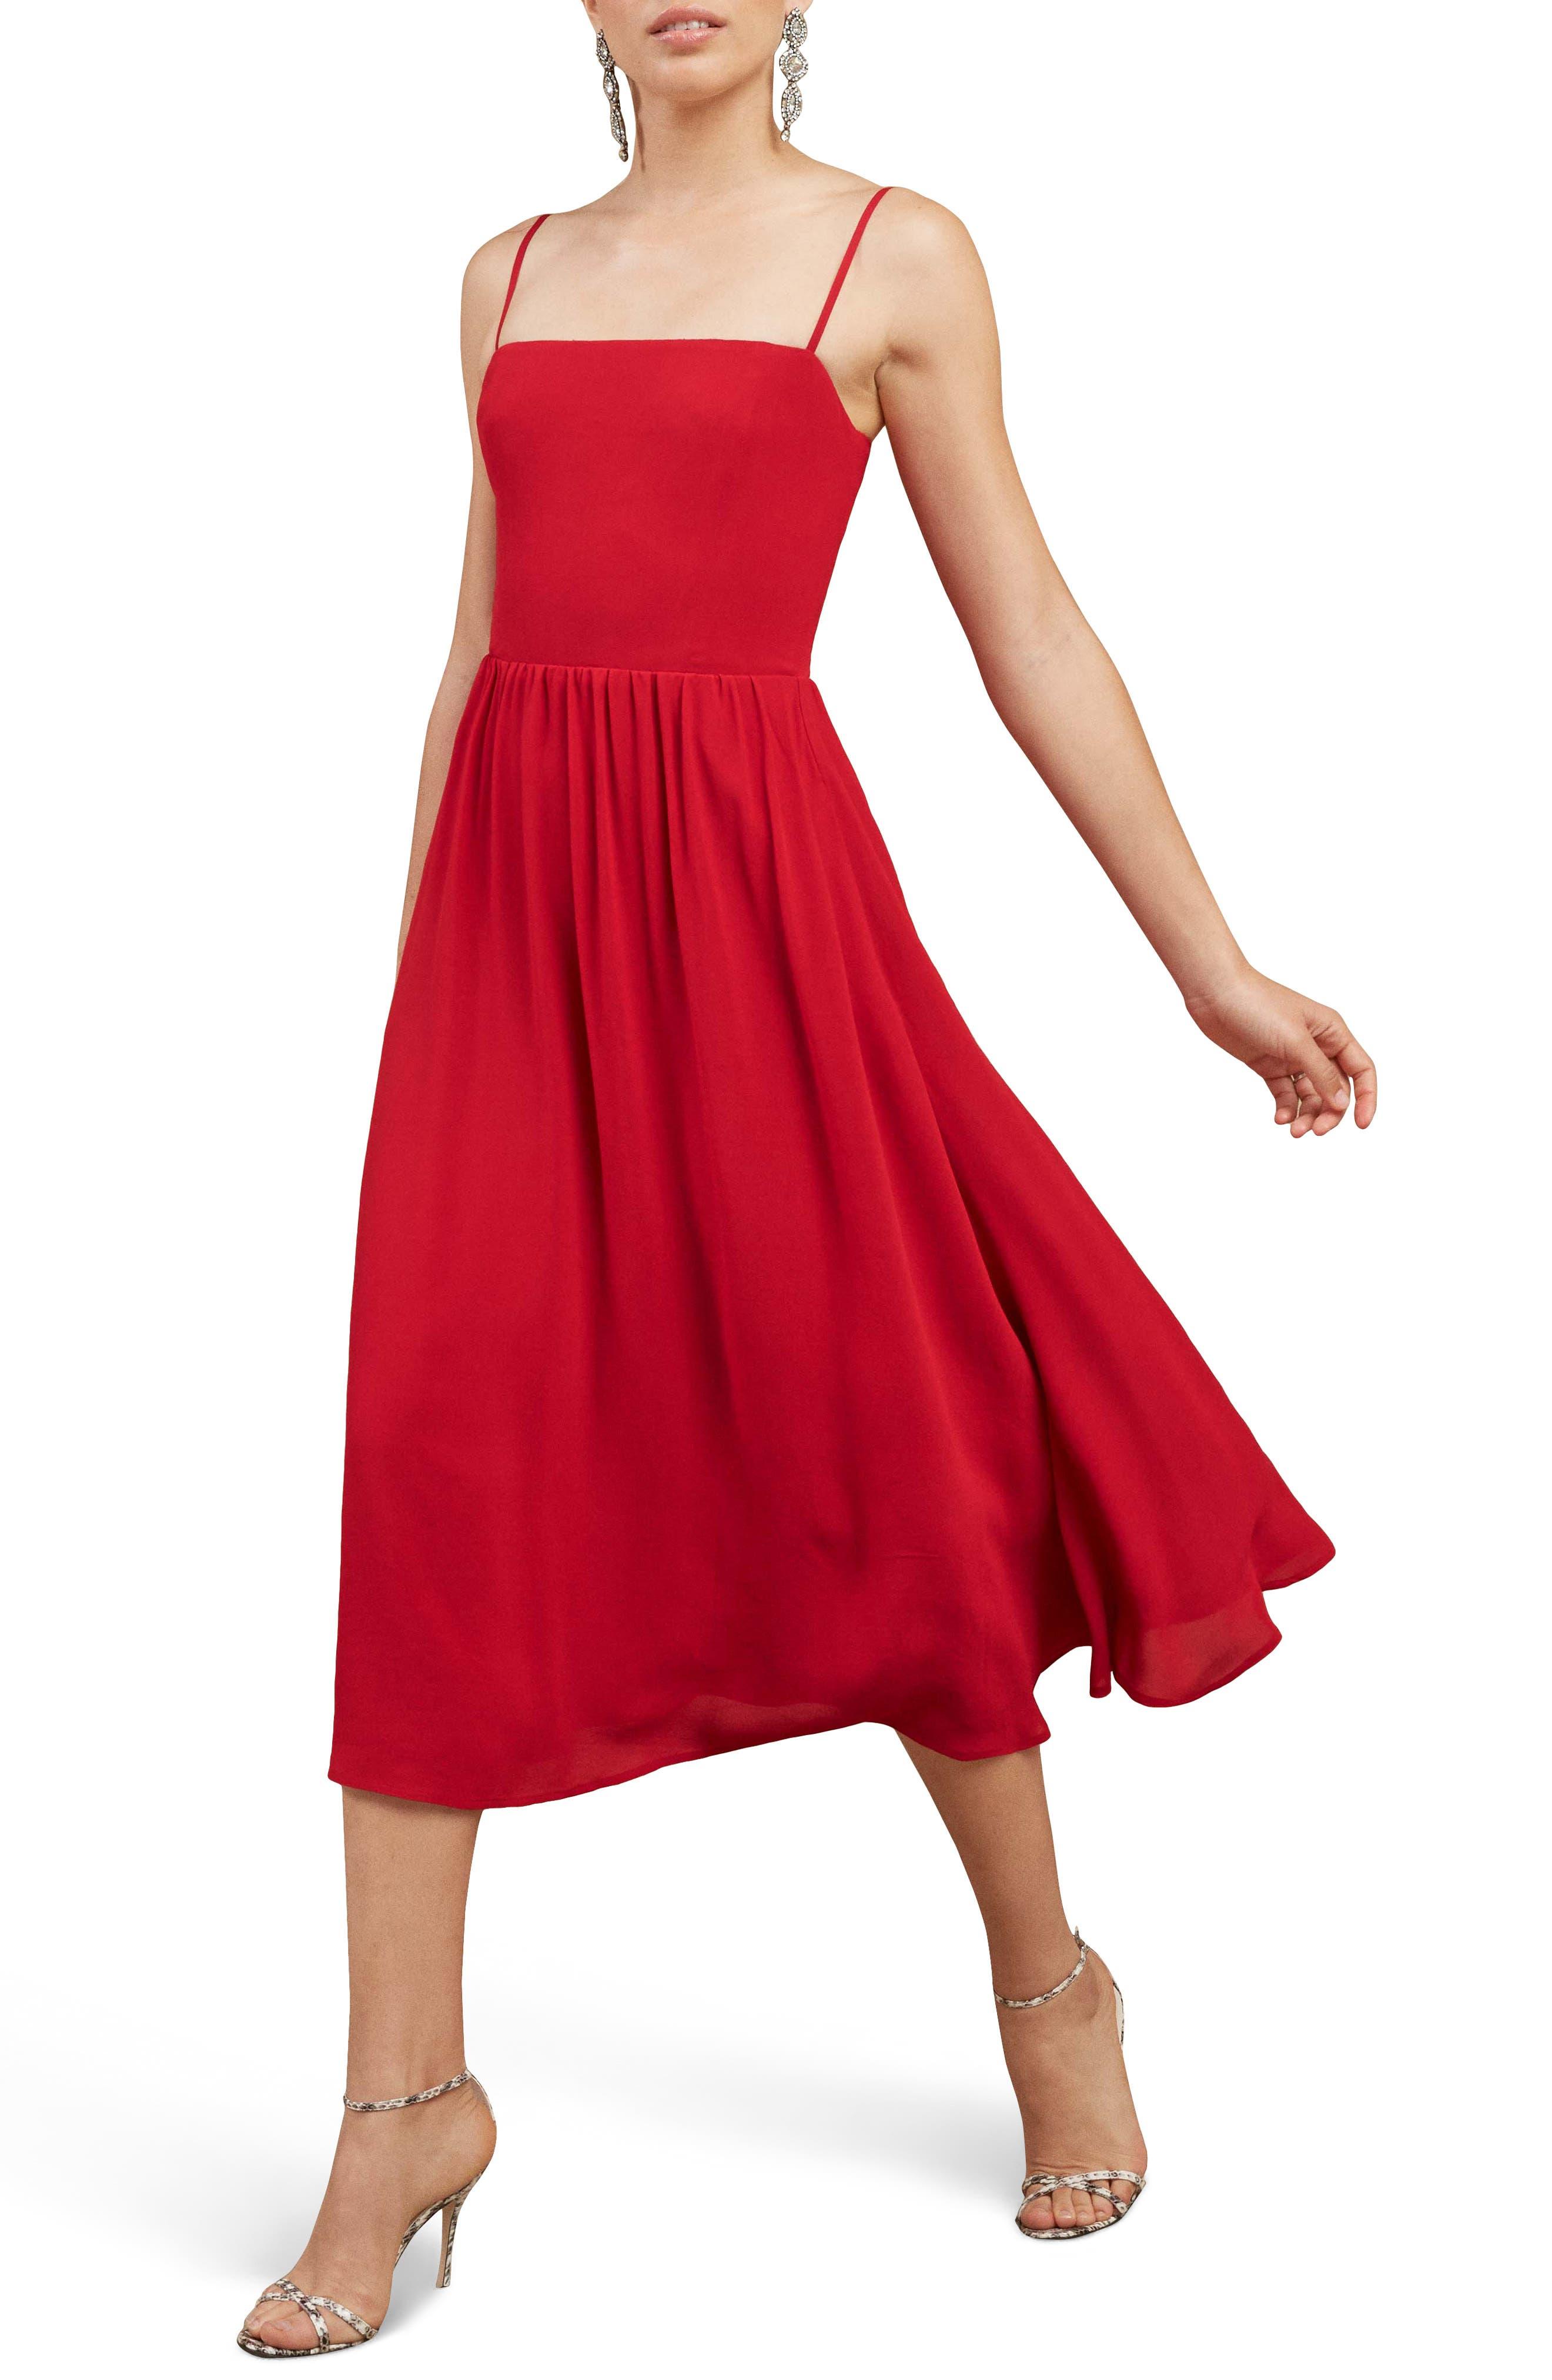 Rosehip Fit & Flare Dress,                             Main thumbnail 1, color,                             LIPSTICK